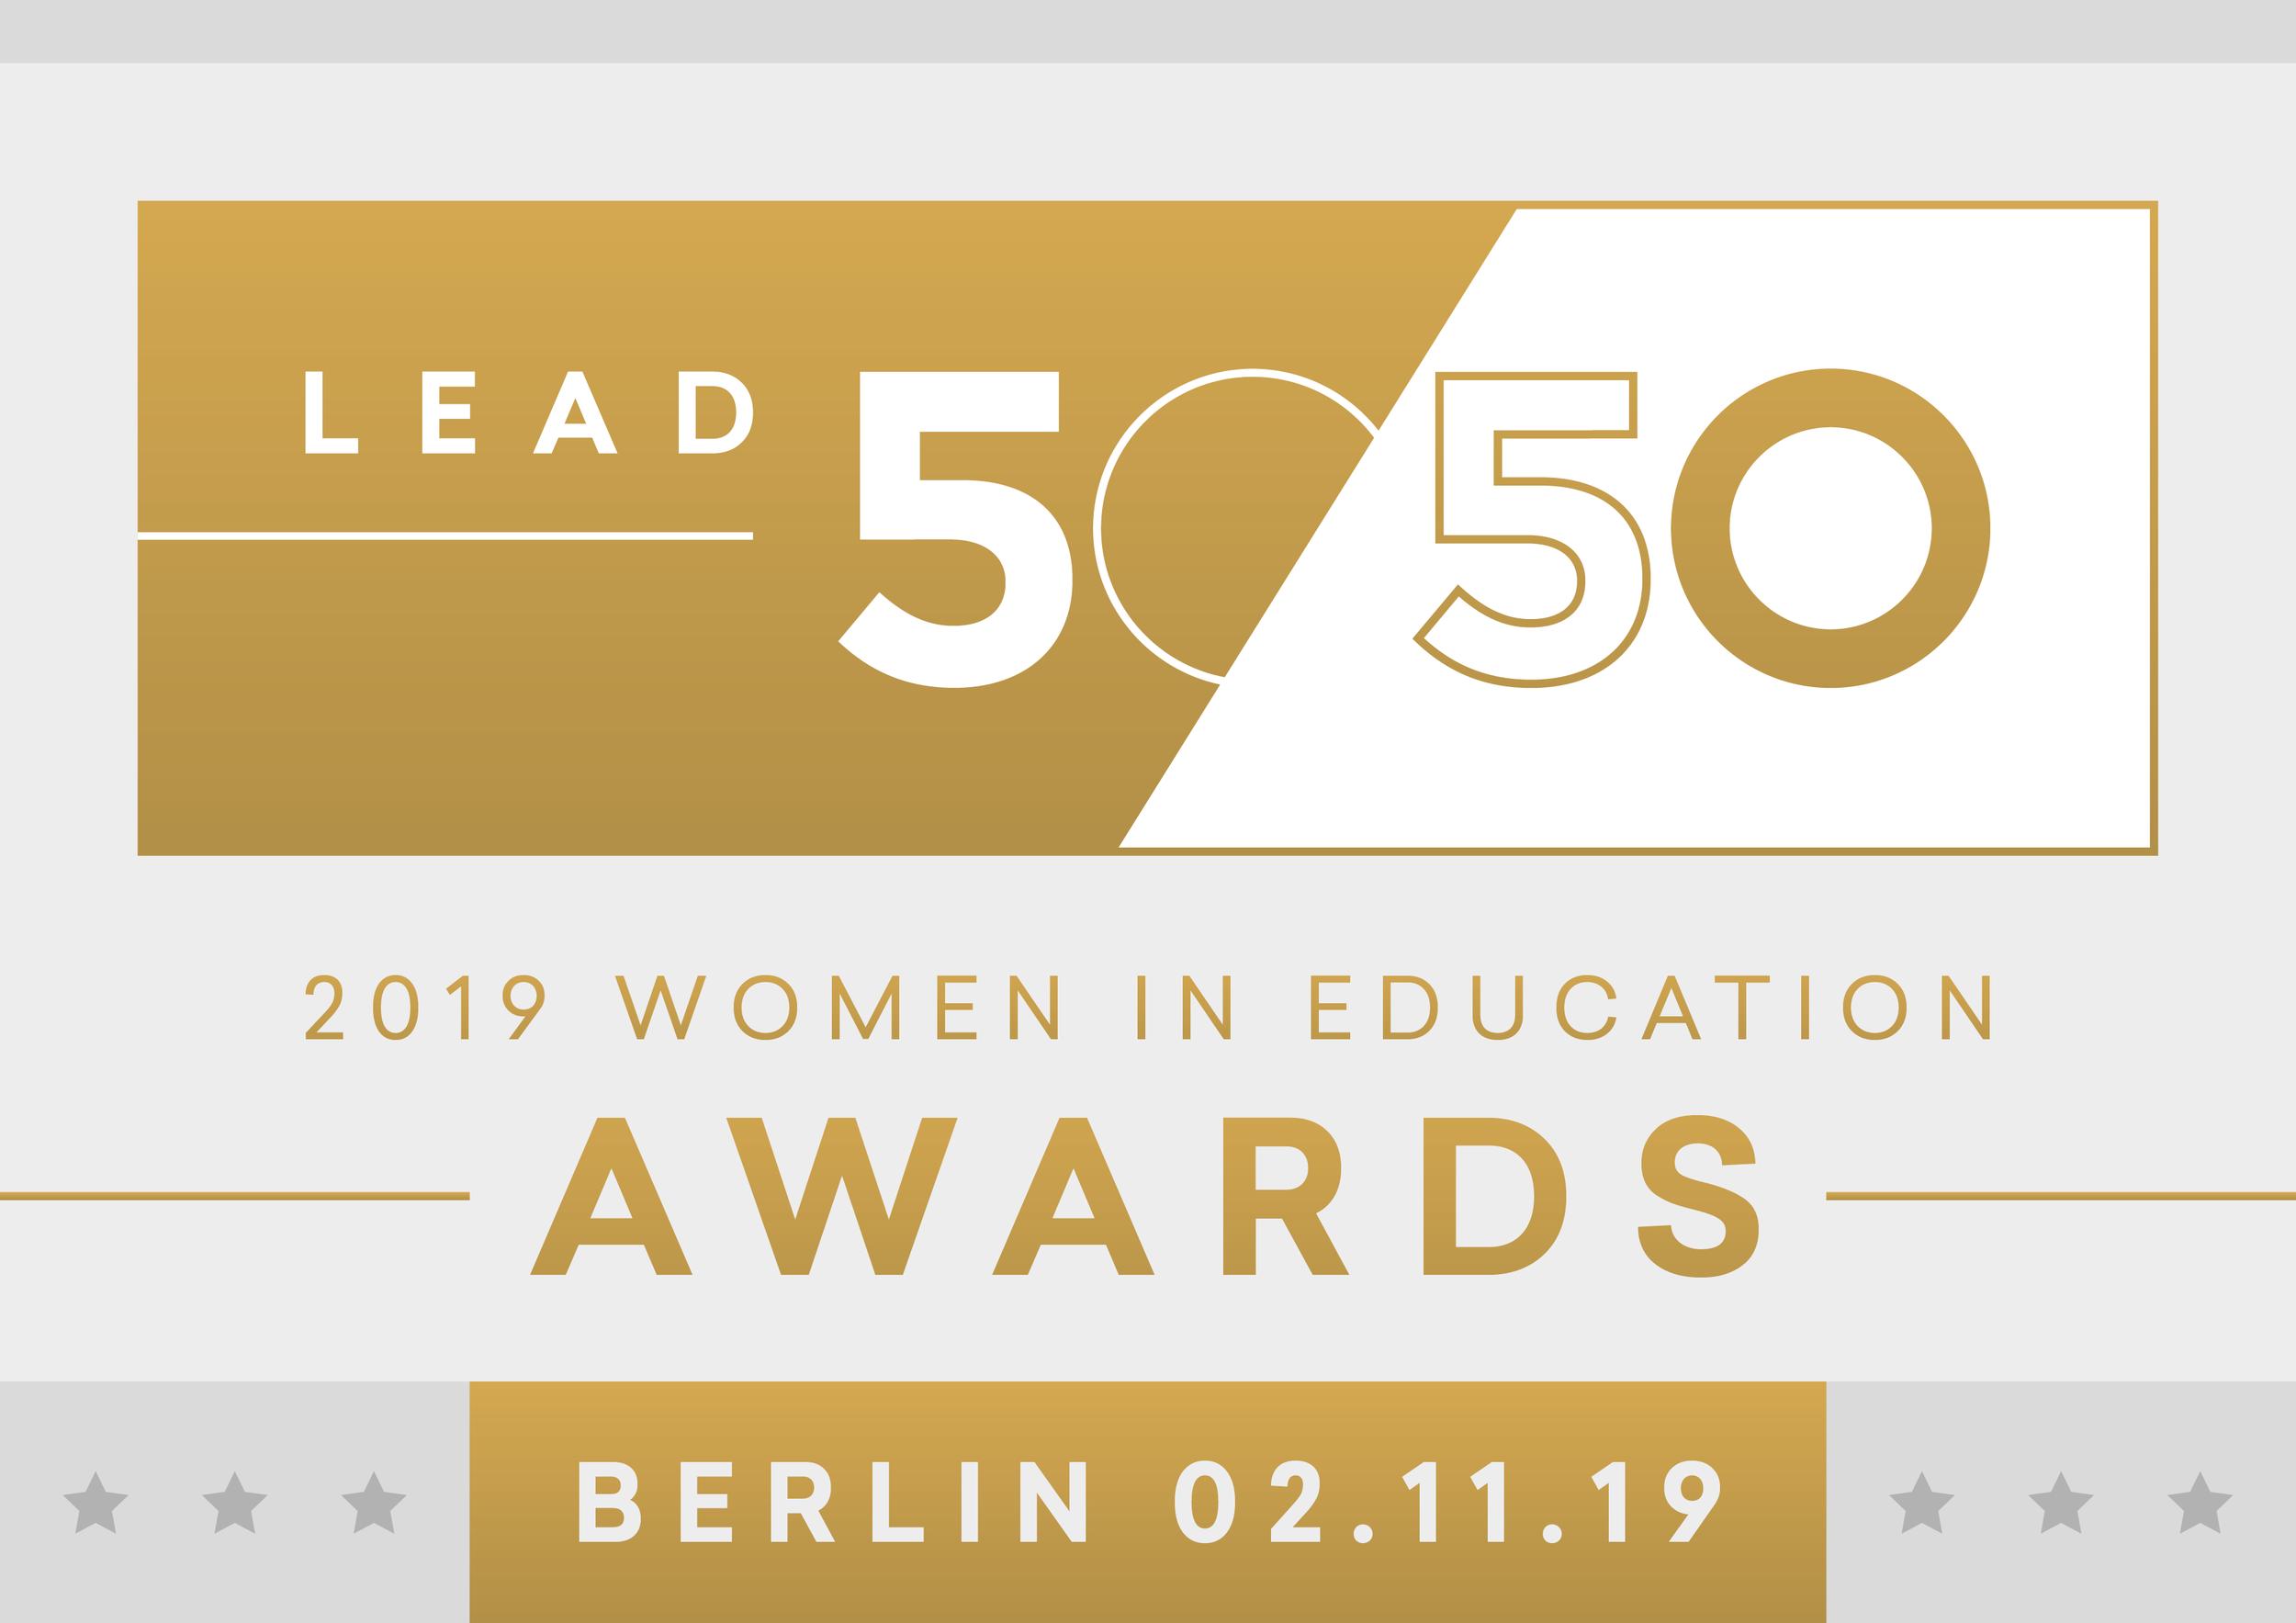 Lead5050_WIE_Awards_2019_v2_Lrg.png